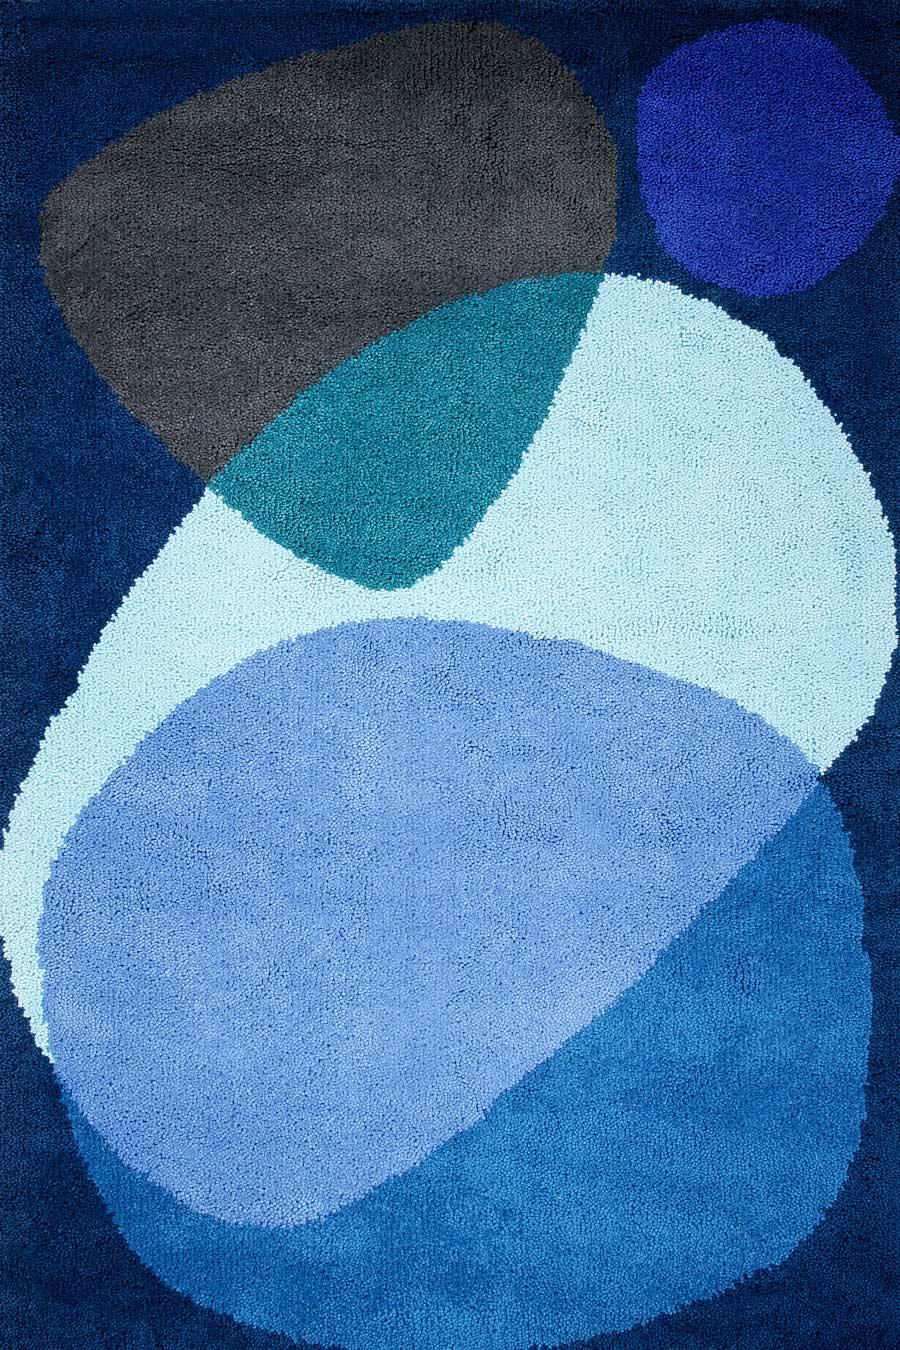 overhead of luna eclipse rug by dinosaur designs large blue shapes